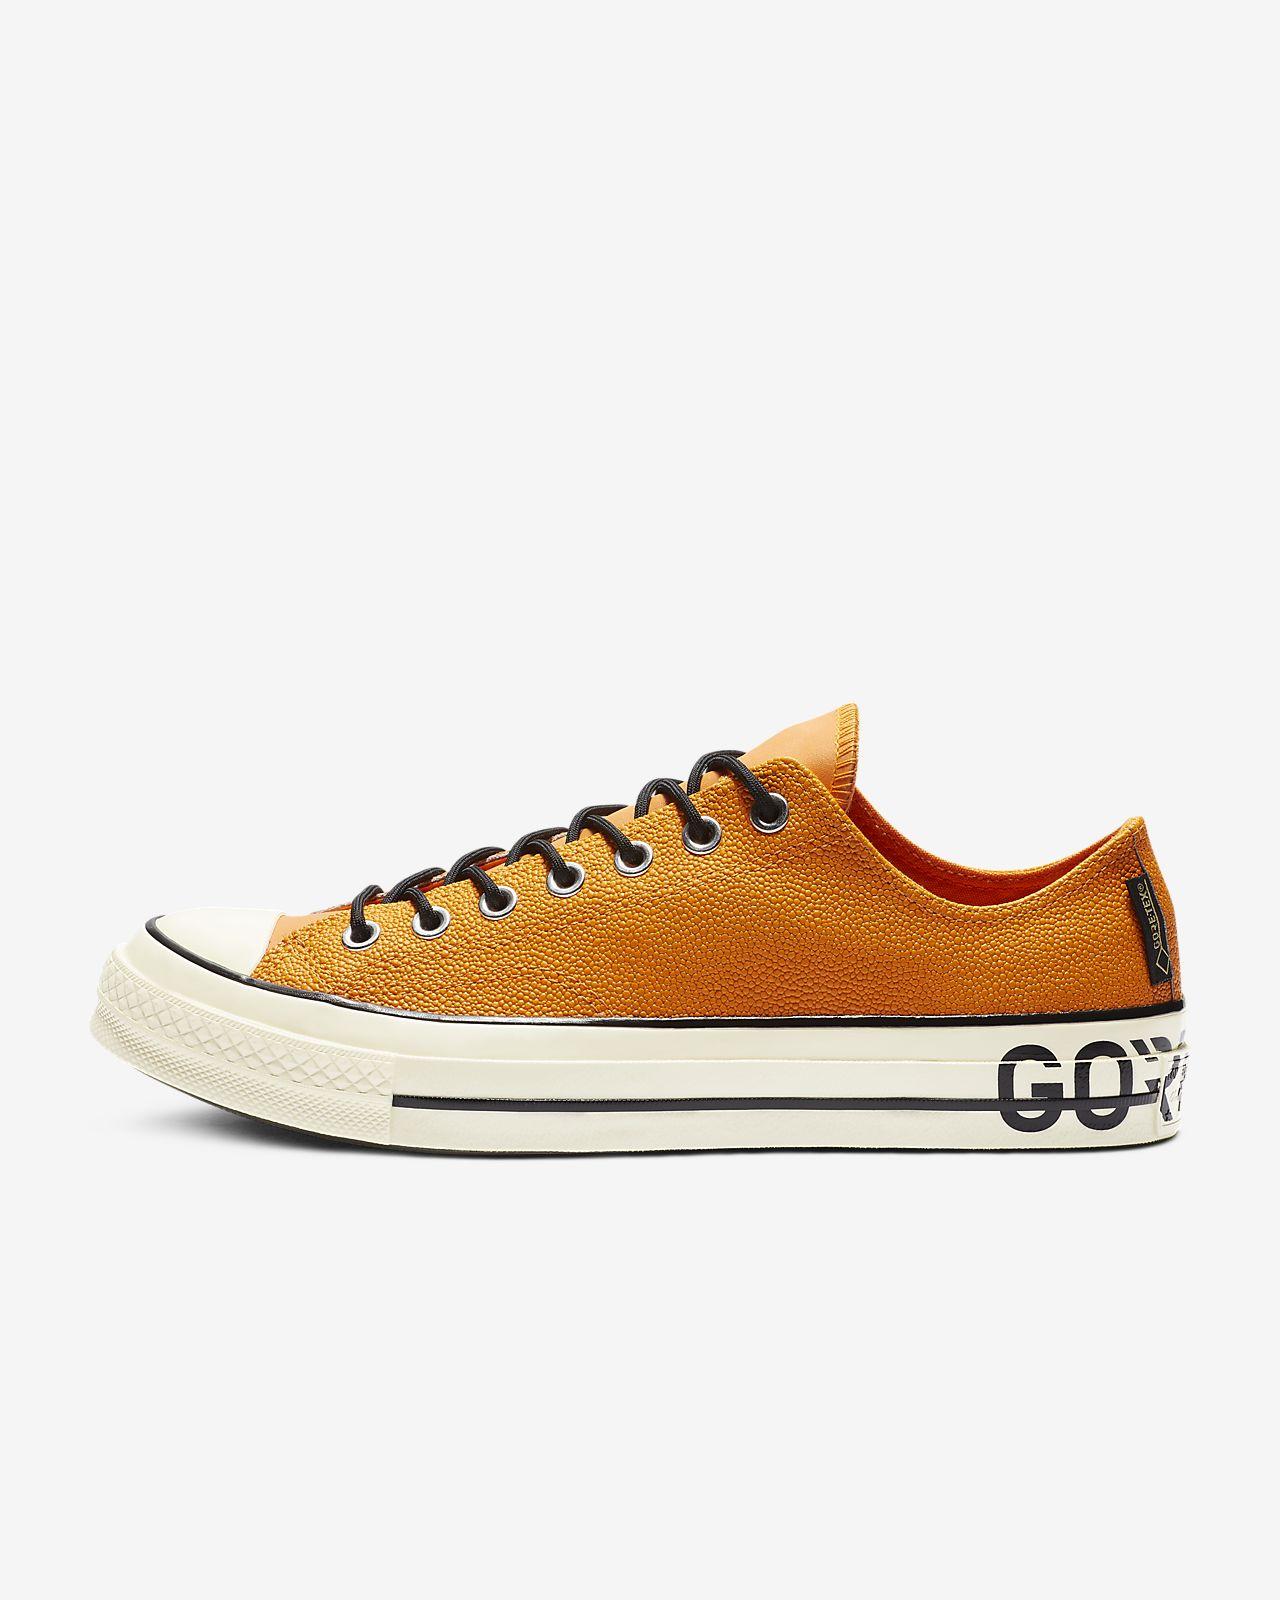 Chuck 70 GORE-TEX Leather Low Top Unisex Shoe